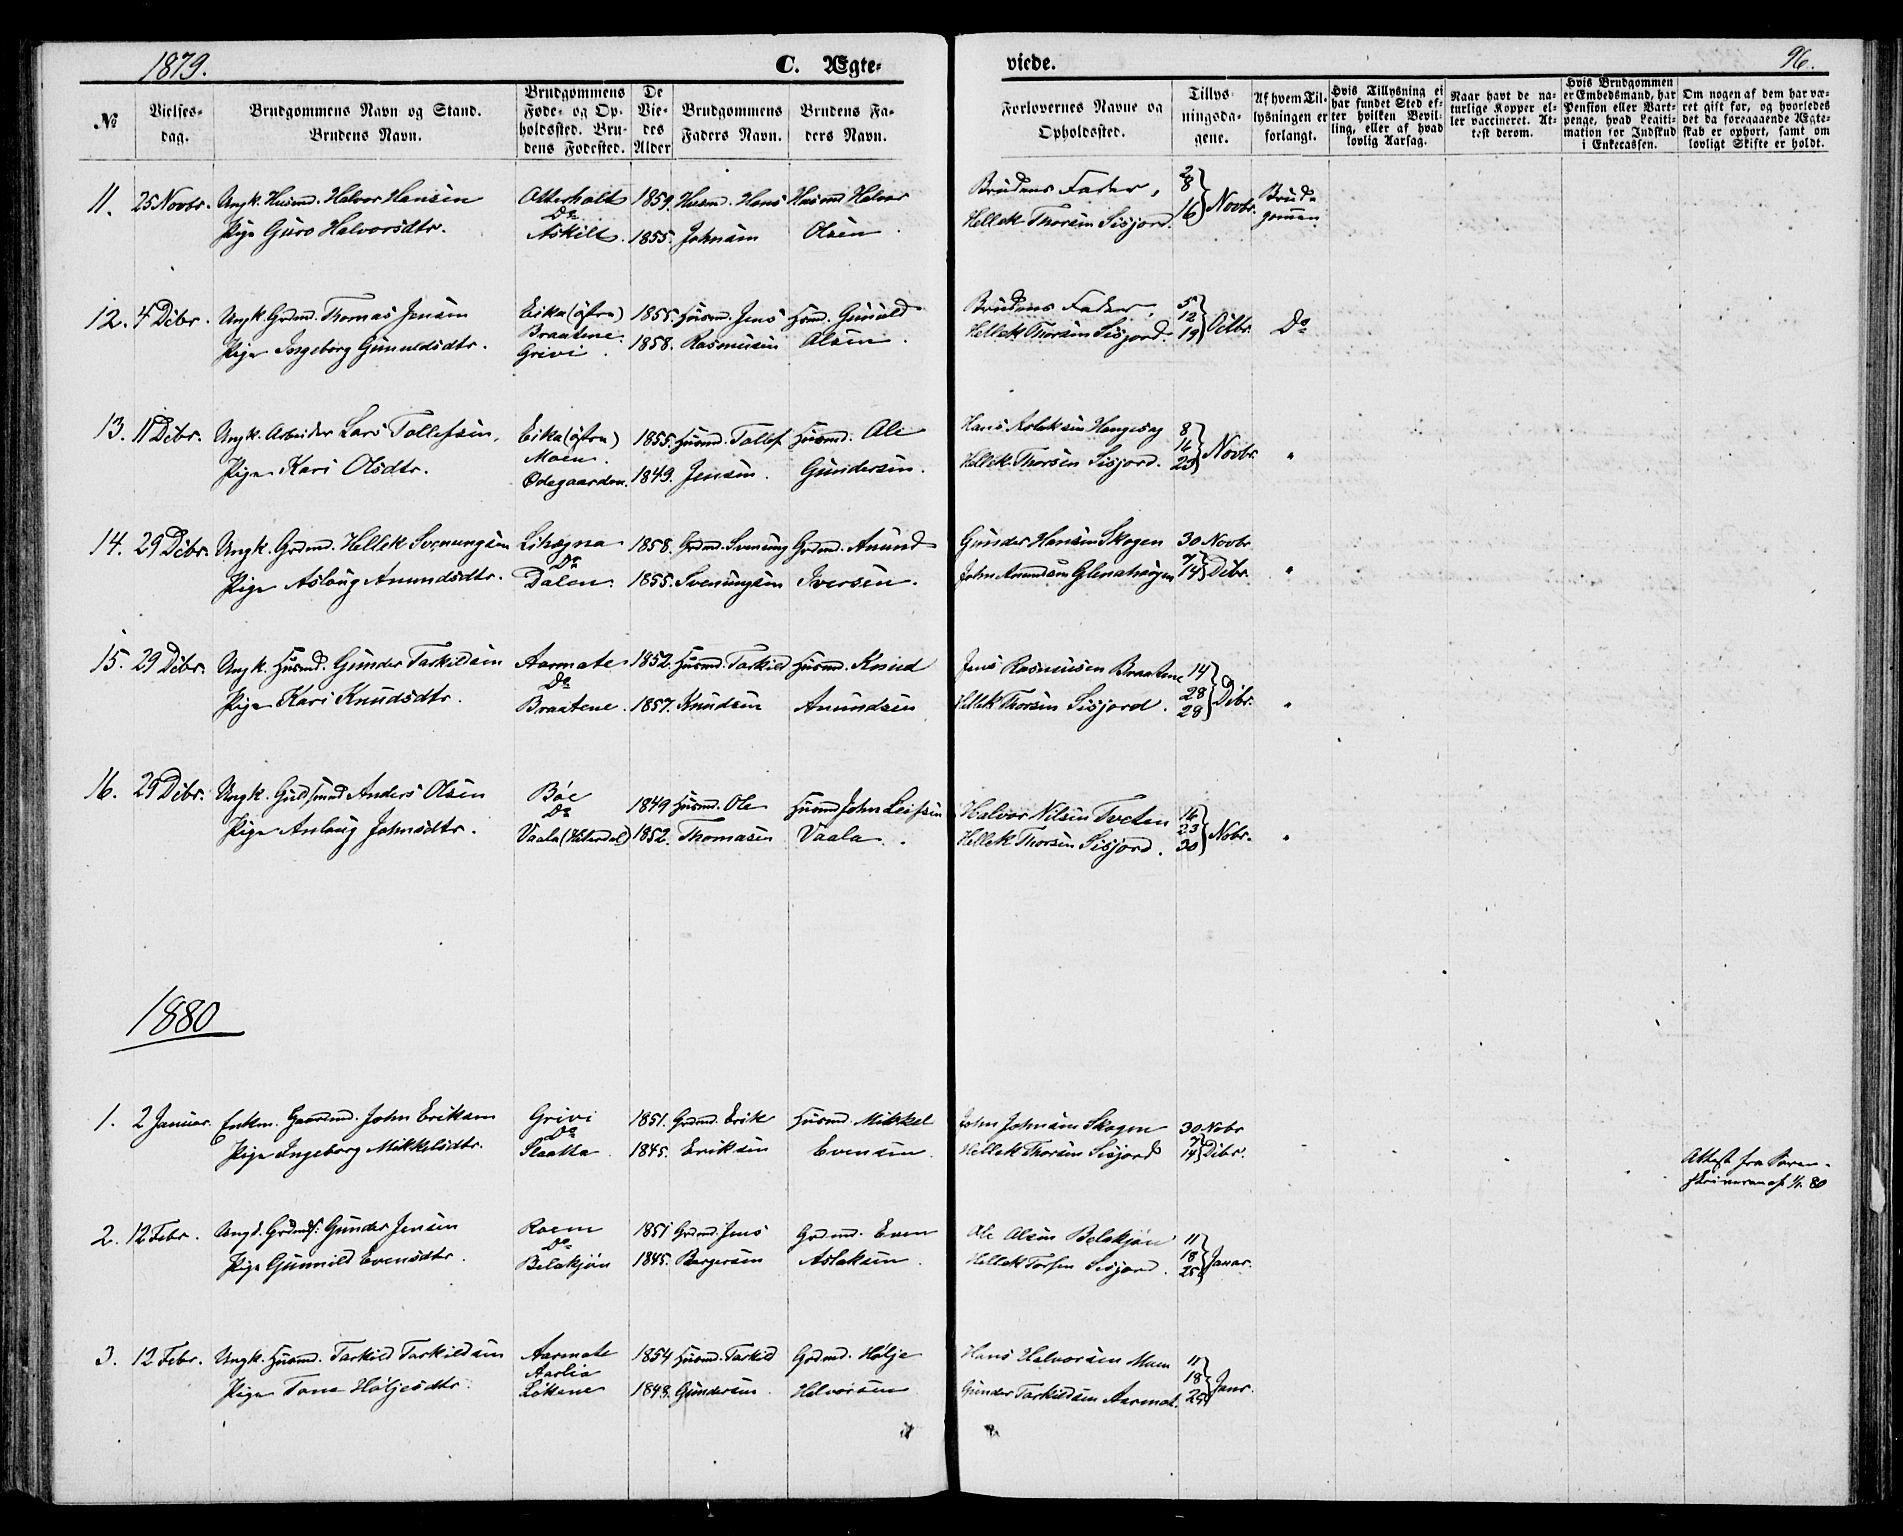 SAKO, Bø kirkebøker, G/Ga/L0004: Klokkerbok nr. 4, 1876-1882, s. 96